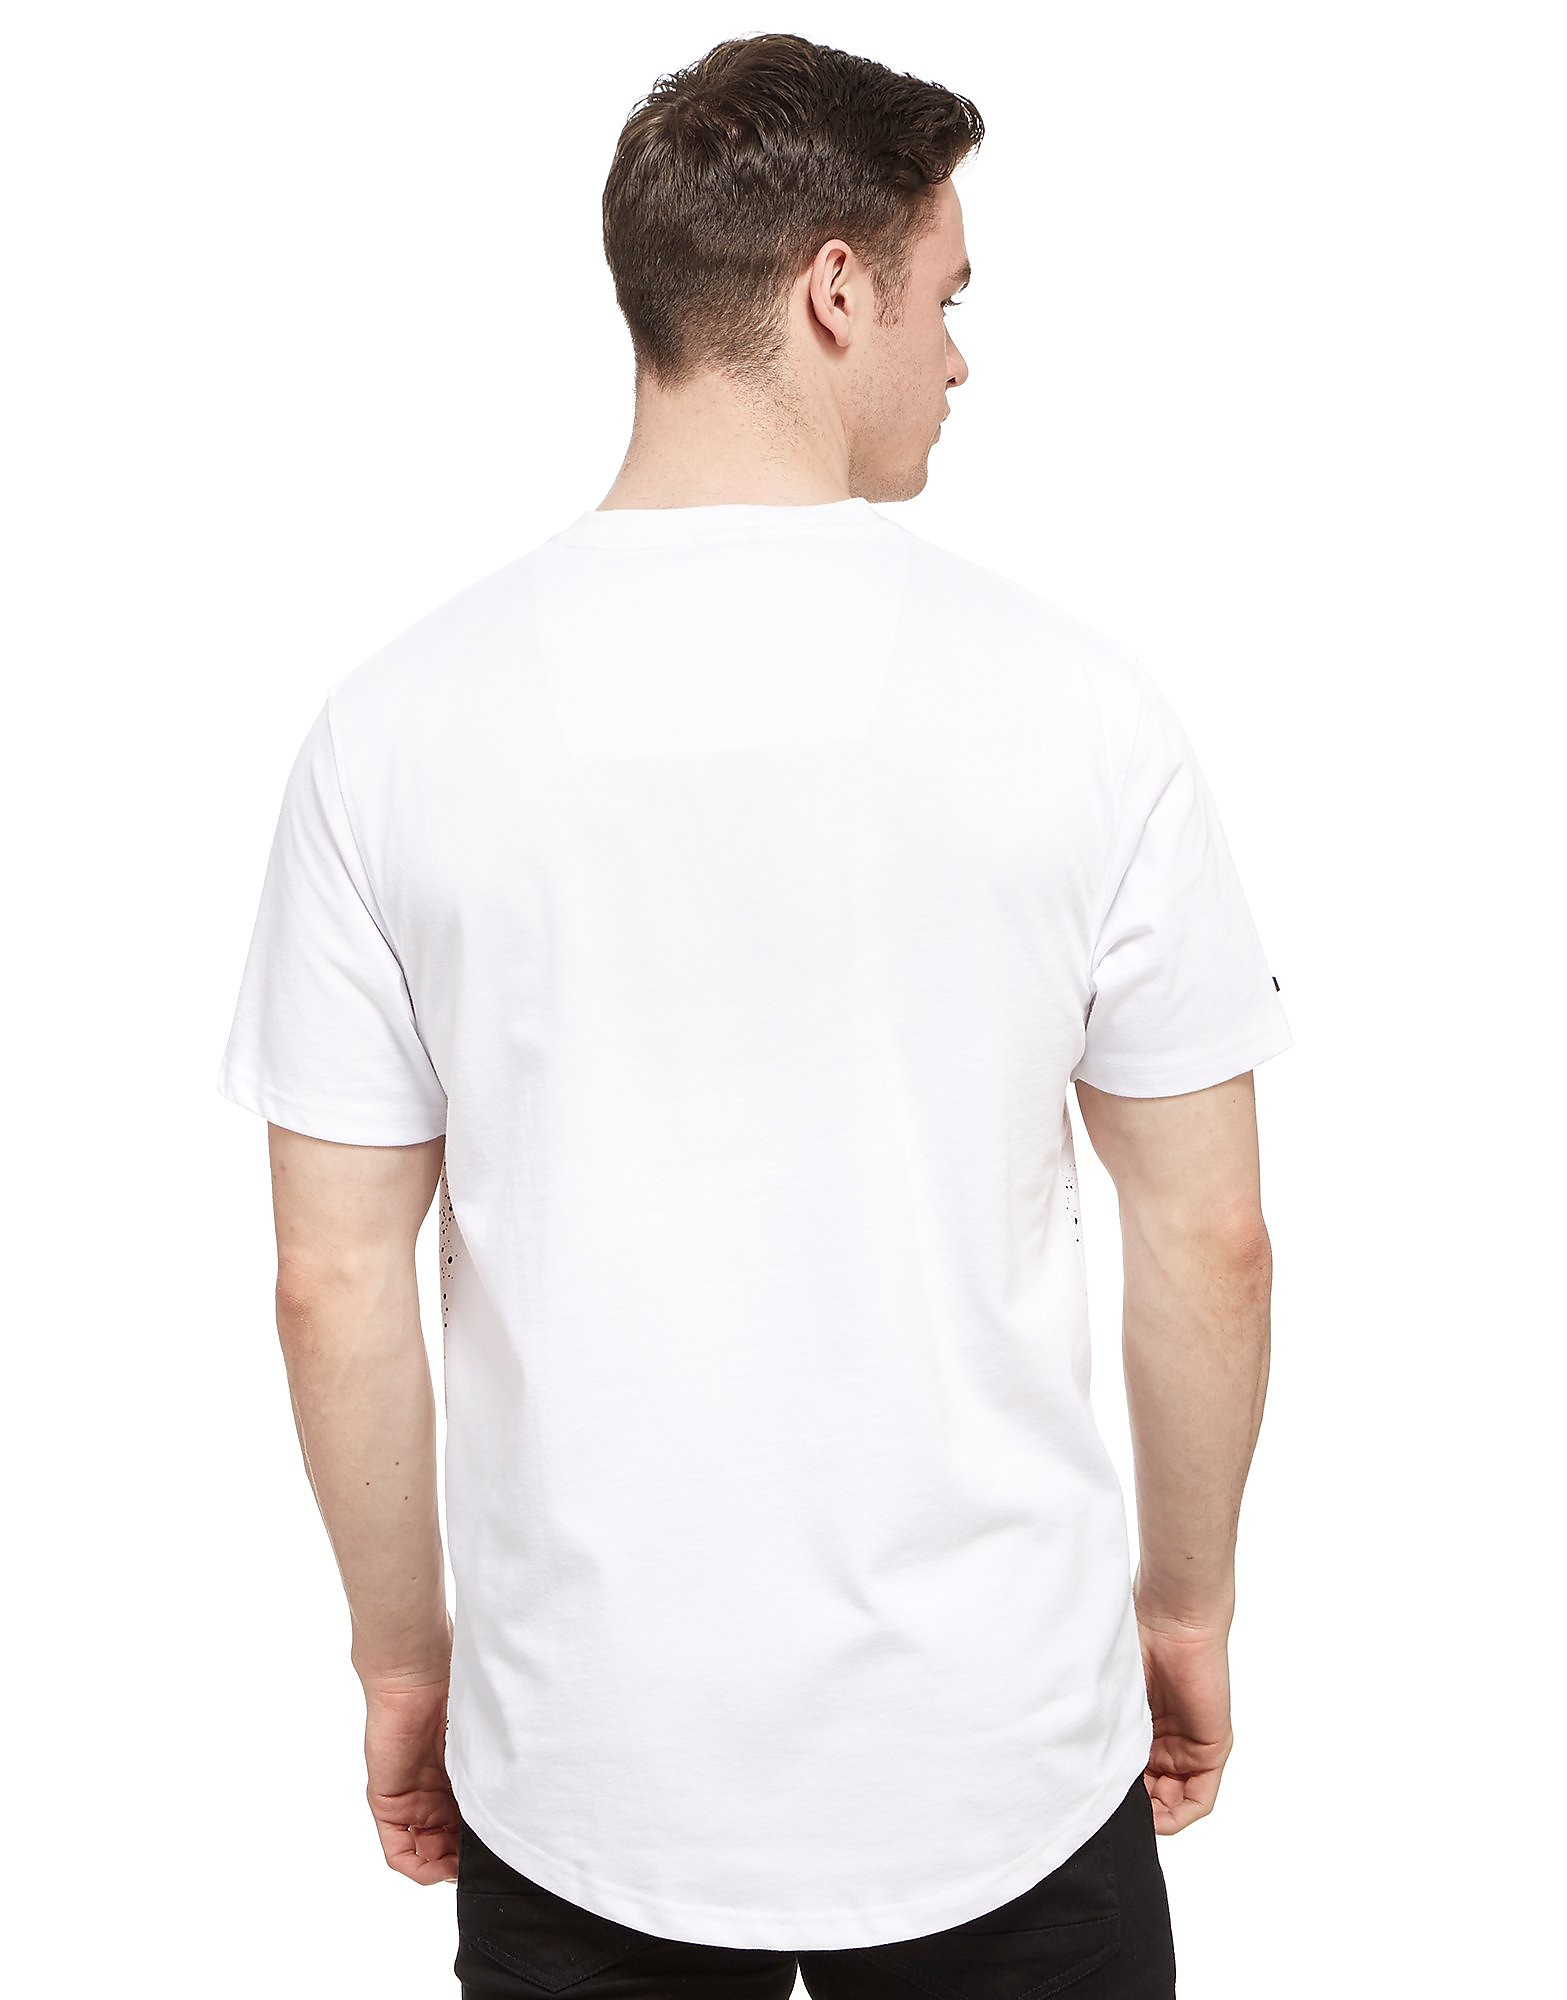 Duffer of St George Presence T-Shirt